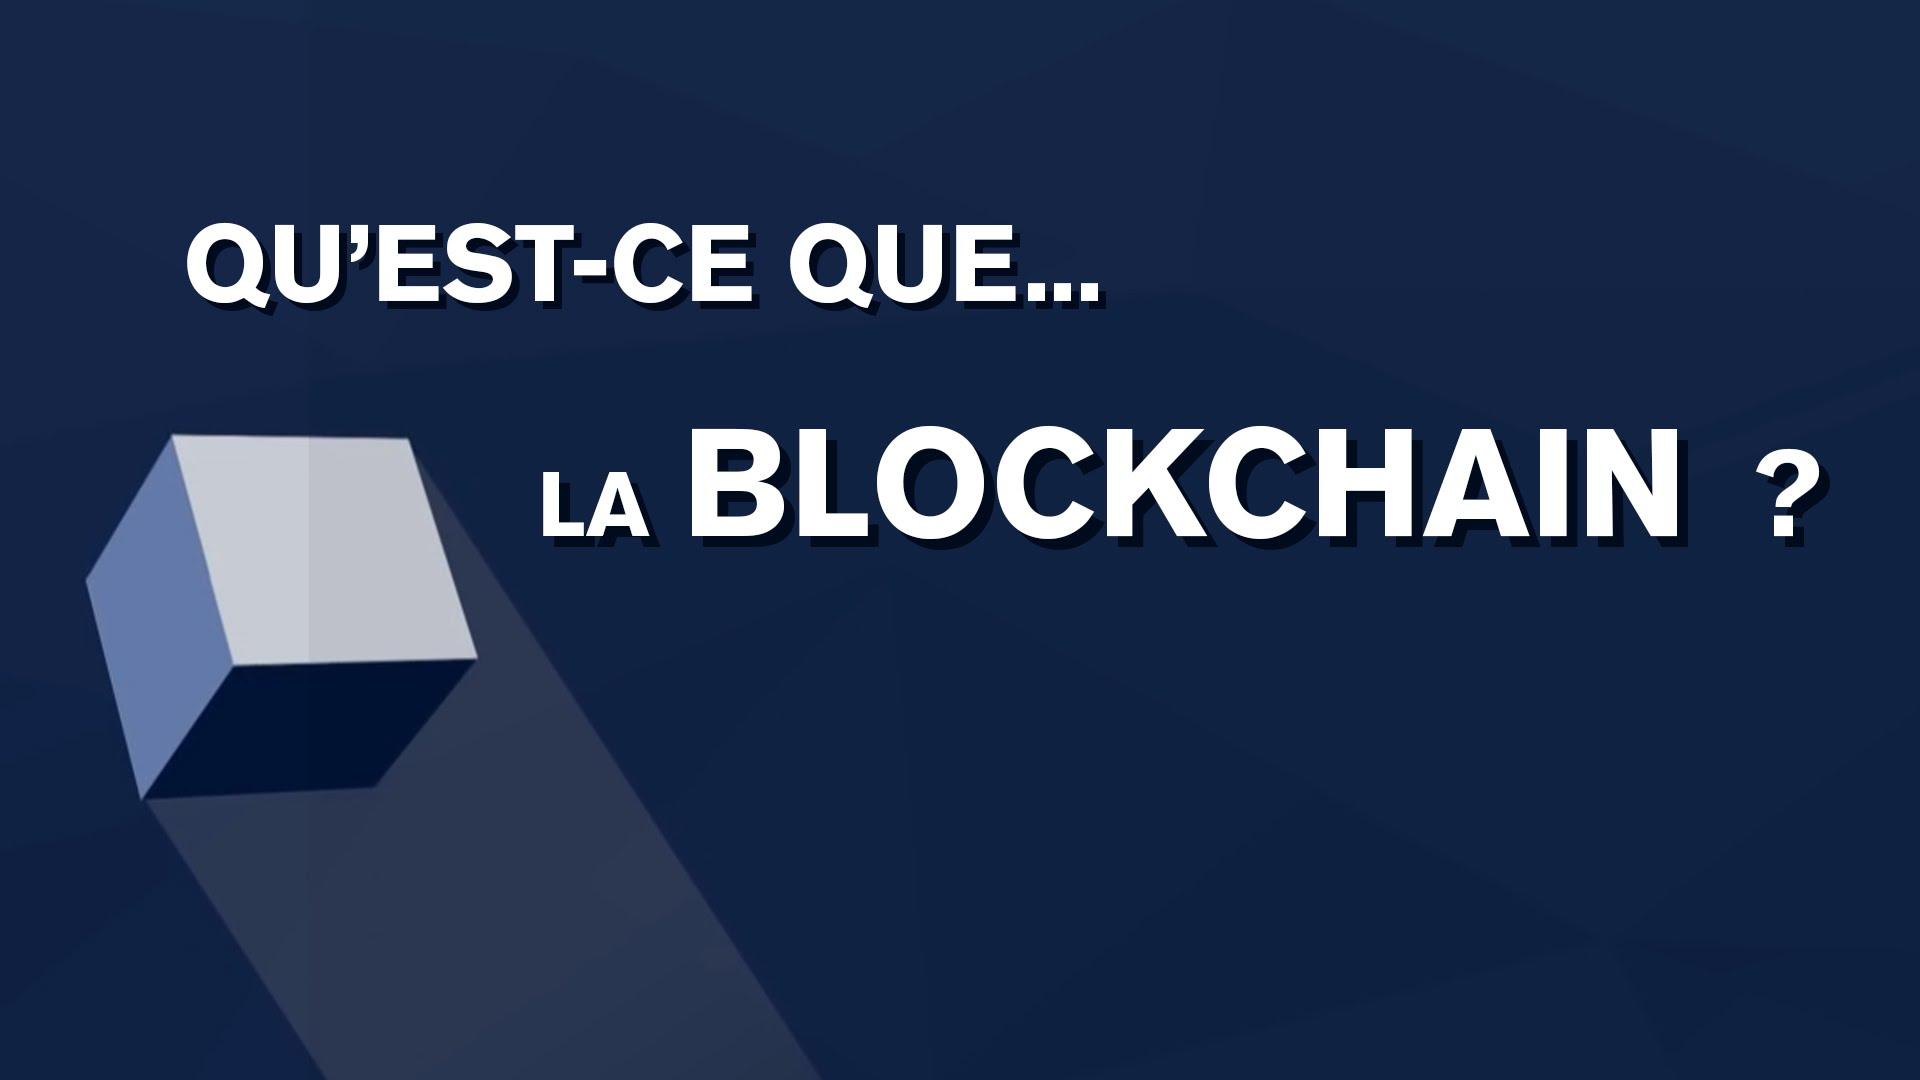 Formation en ligne Blockchain